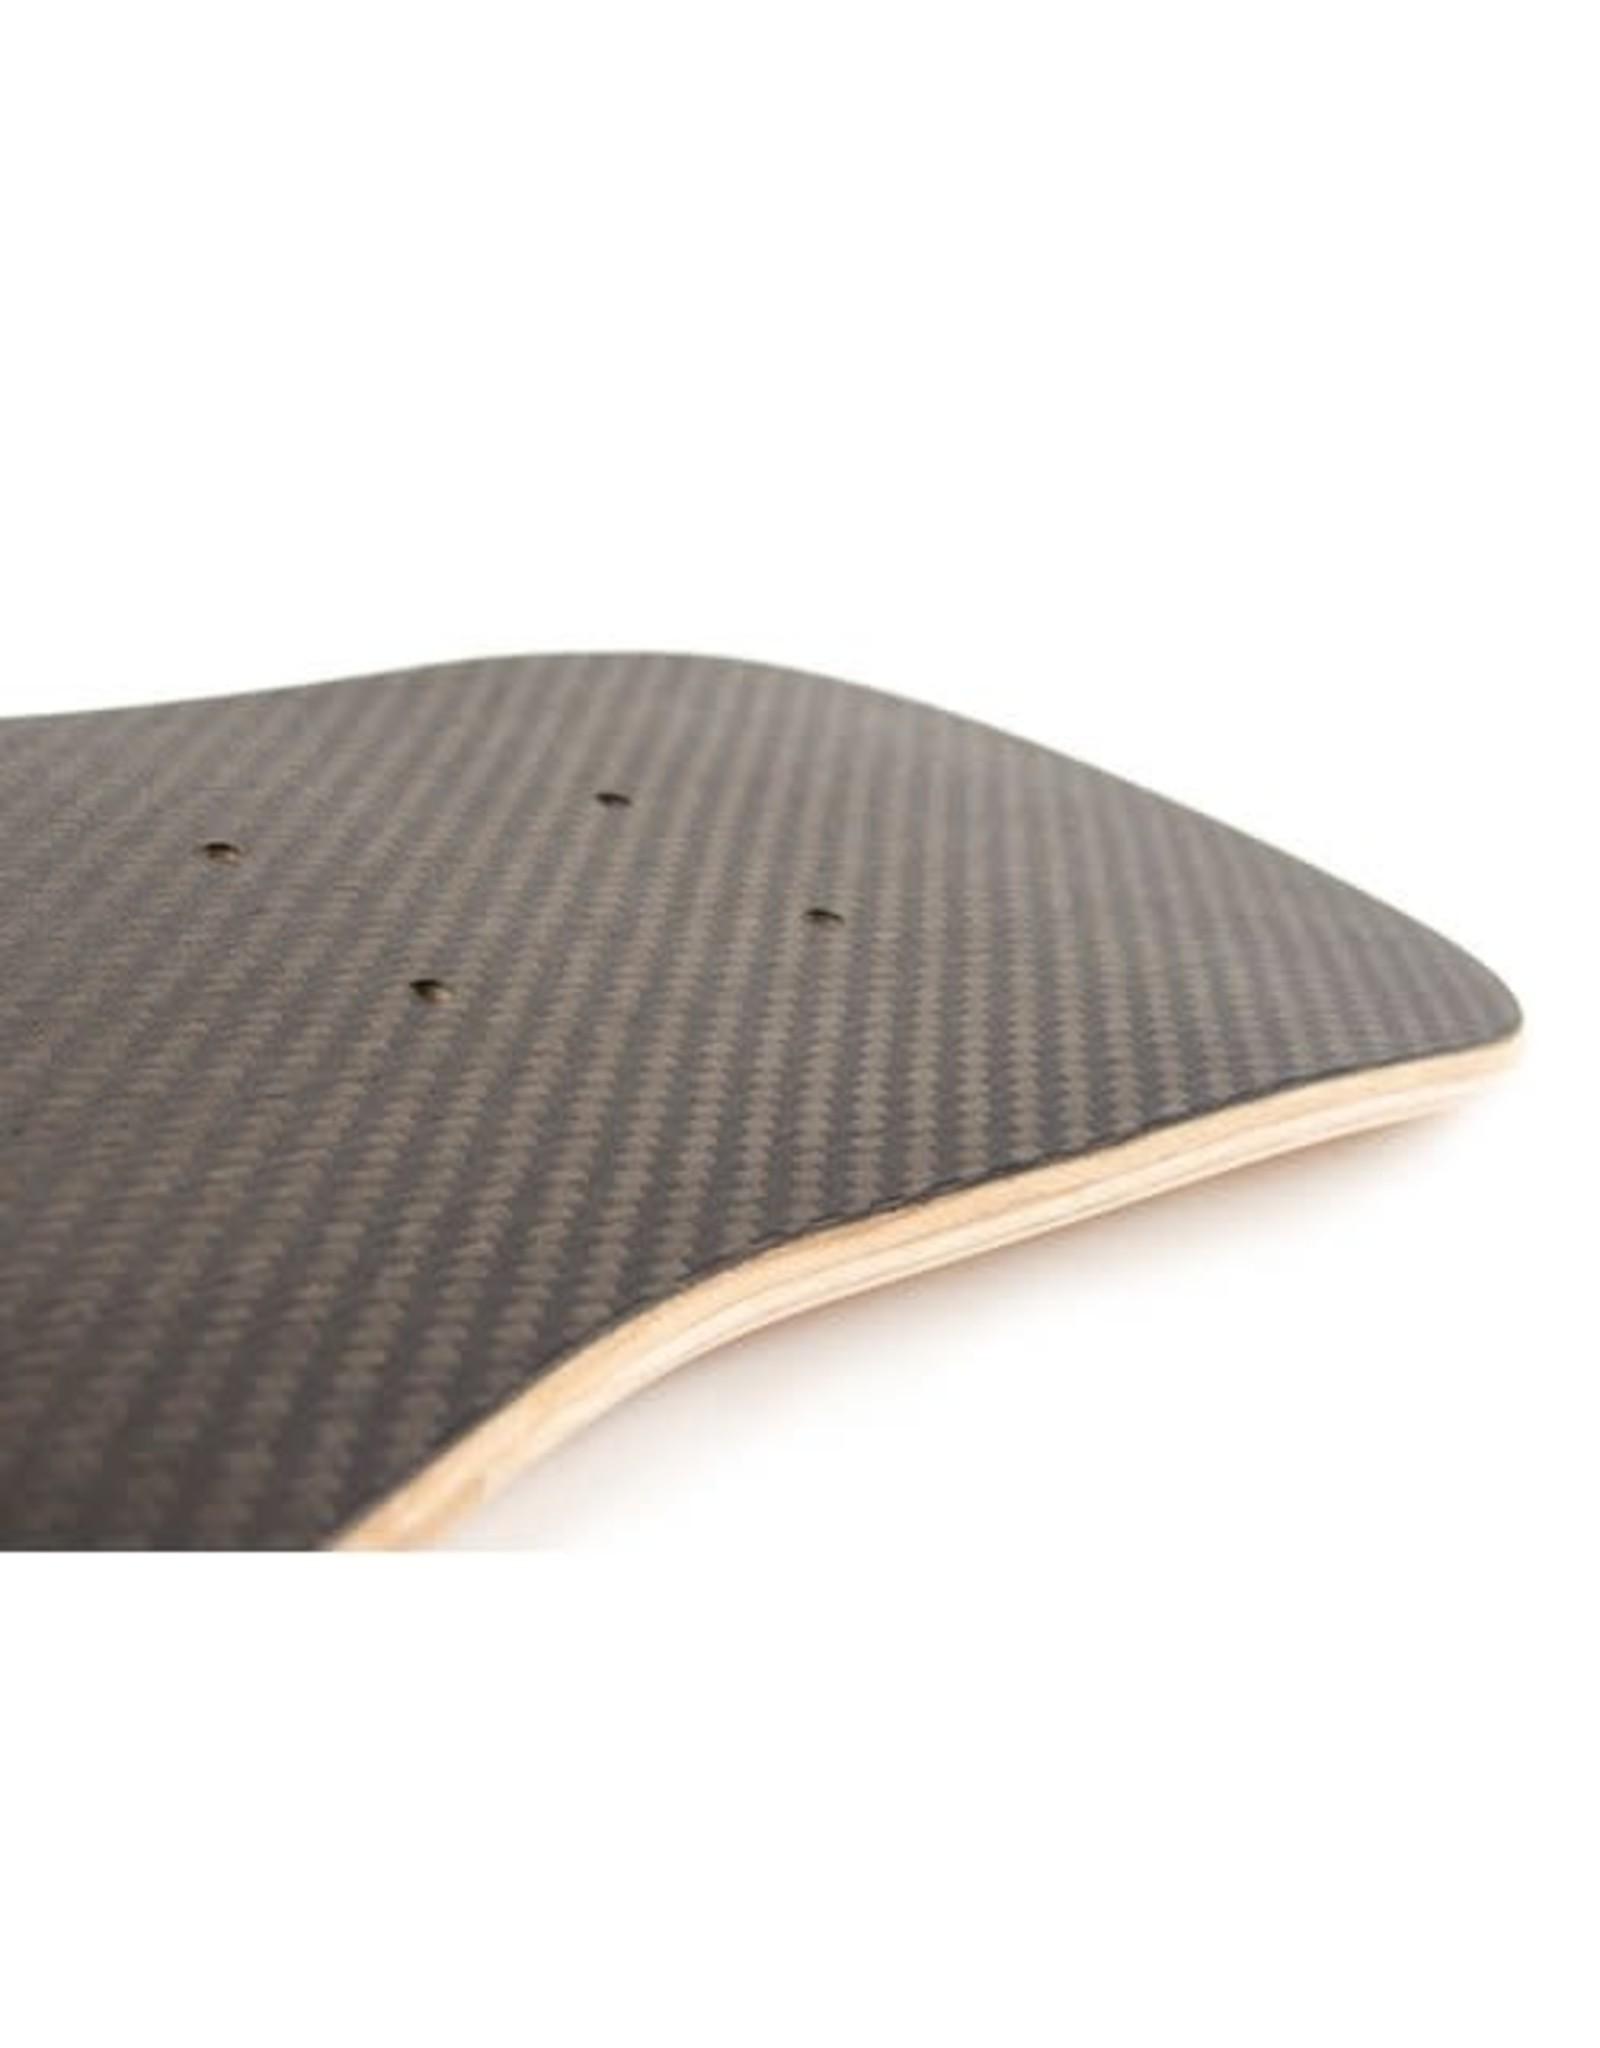 Jucker Hawaii Jucker Hawaii 118 cm Longboard Dancing Deck Carbon Flex 2